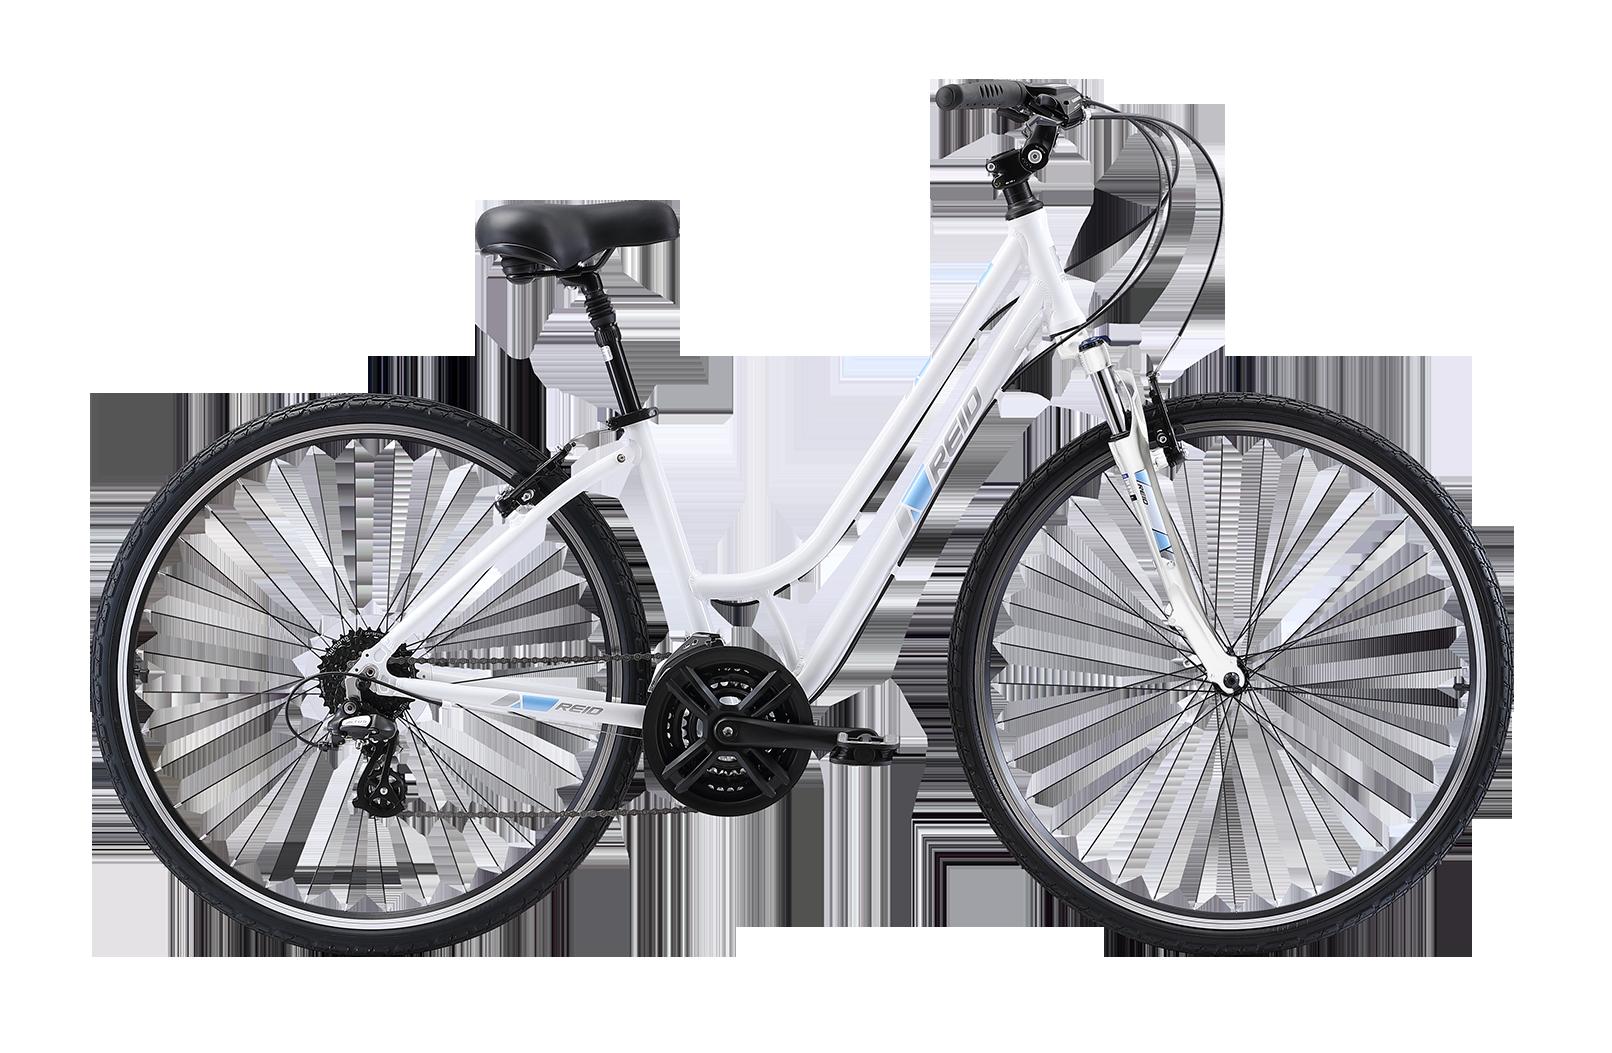 IMG 0040 - Reid ® - Comfort 3 Step Thru Bike